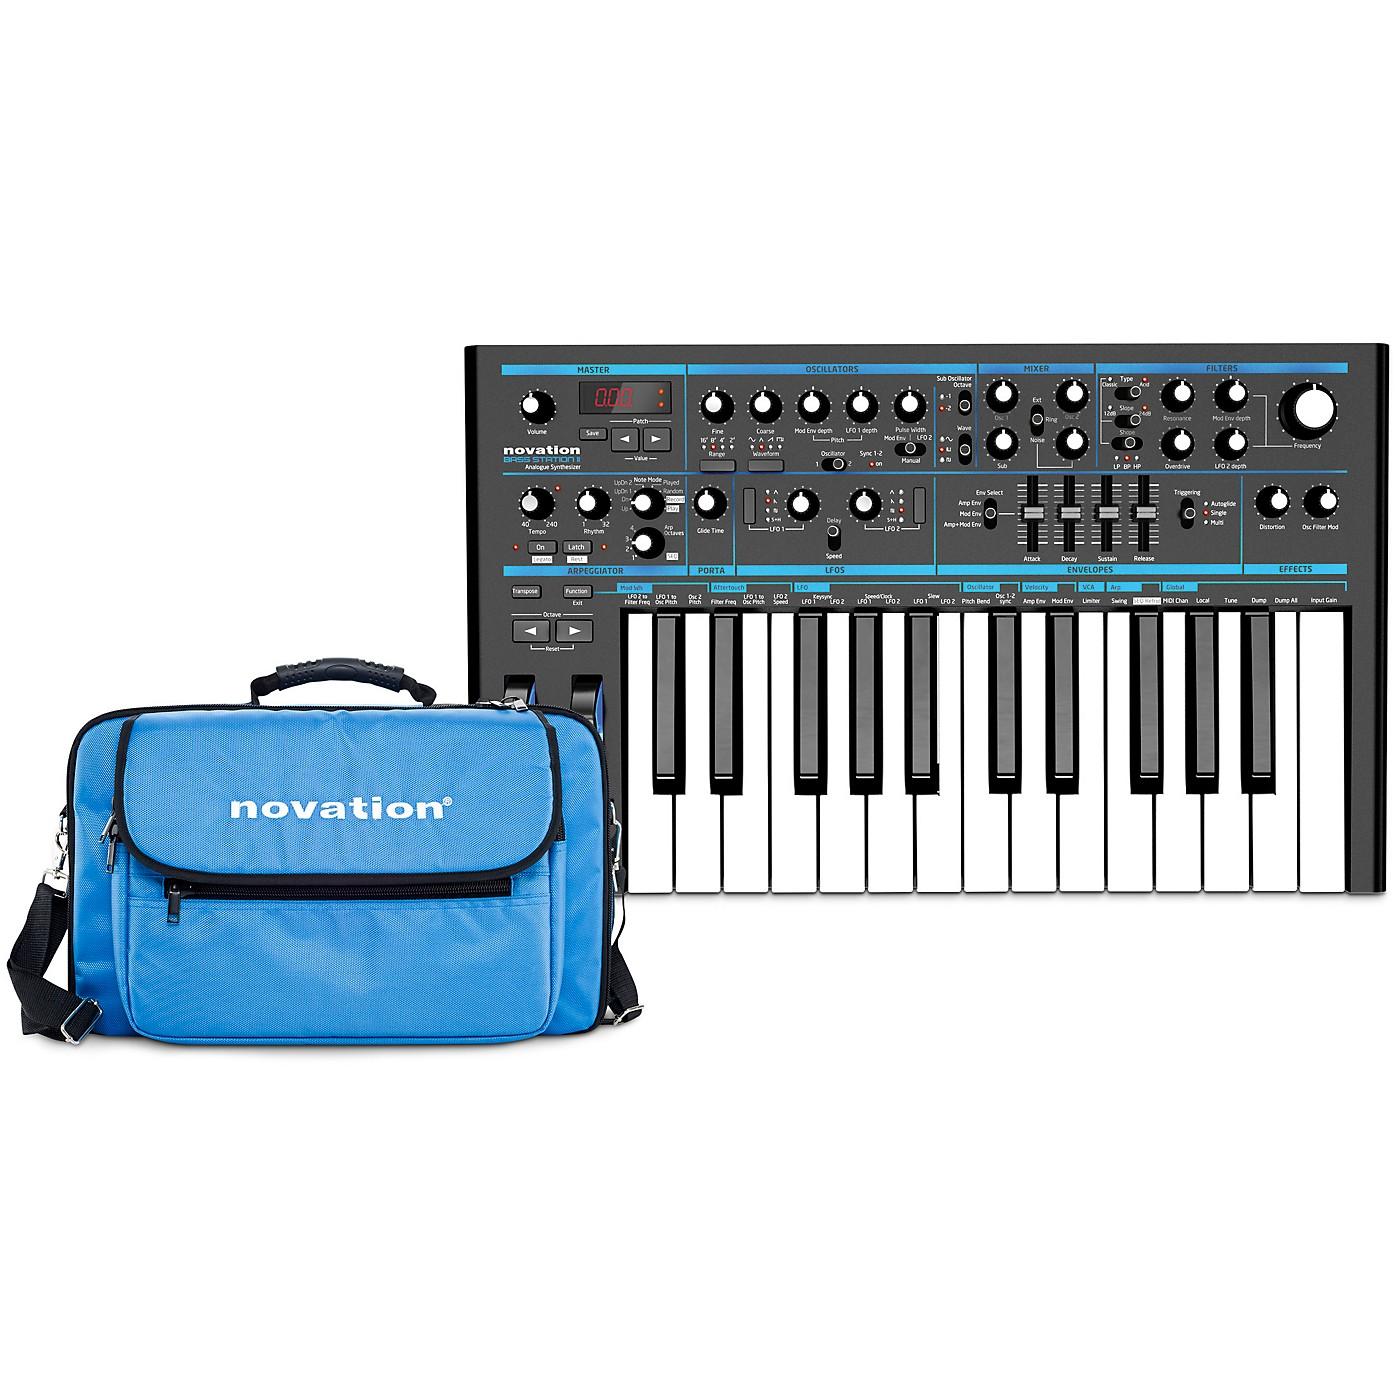 Novation Bass Station II Analog Synthesizer with Gig Bag thumbnail